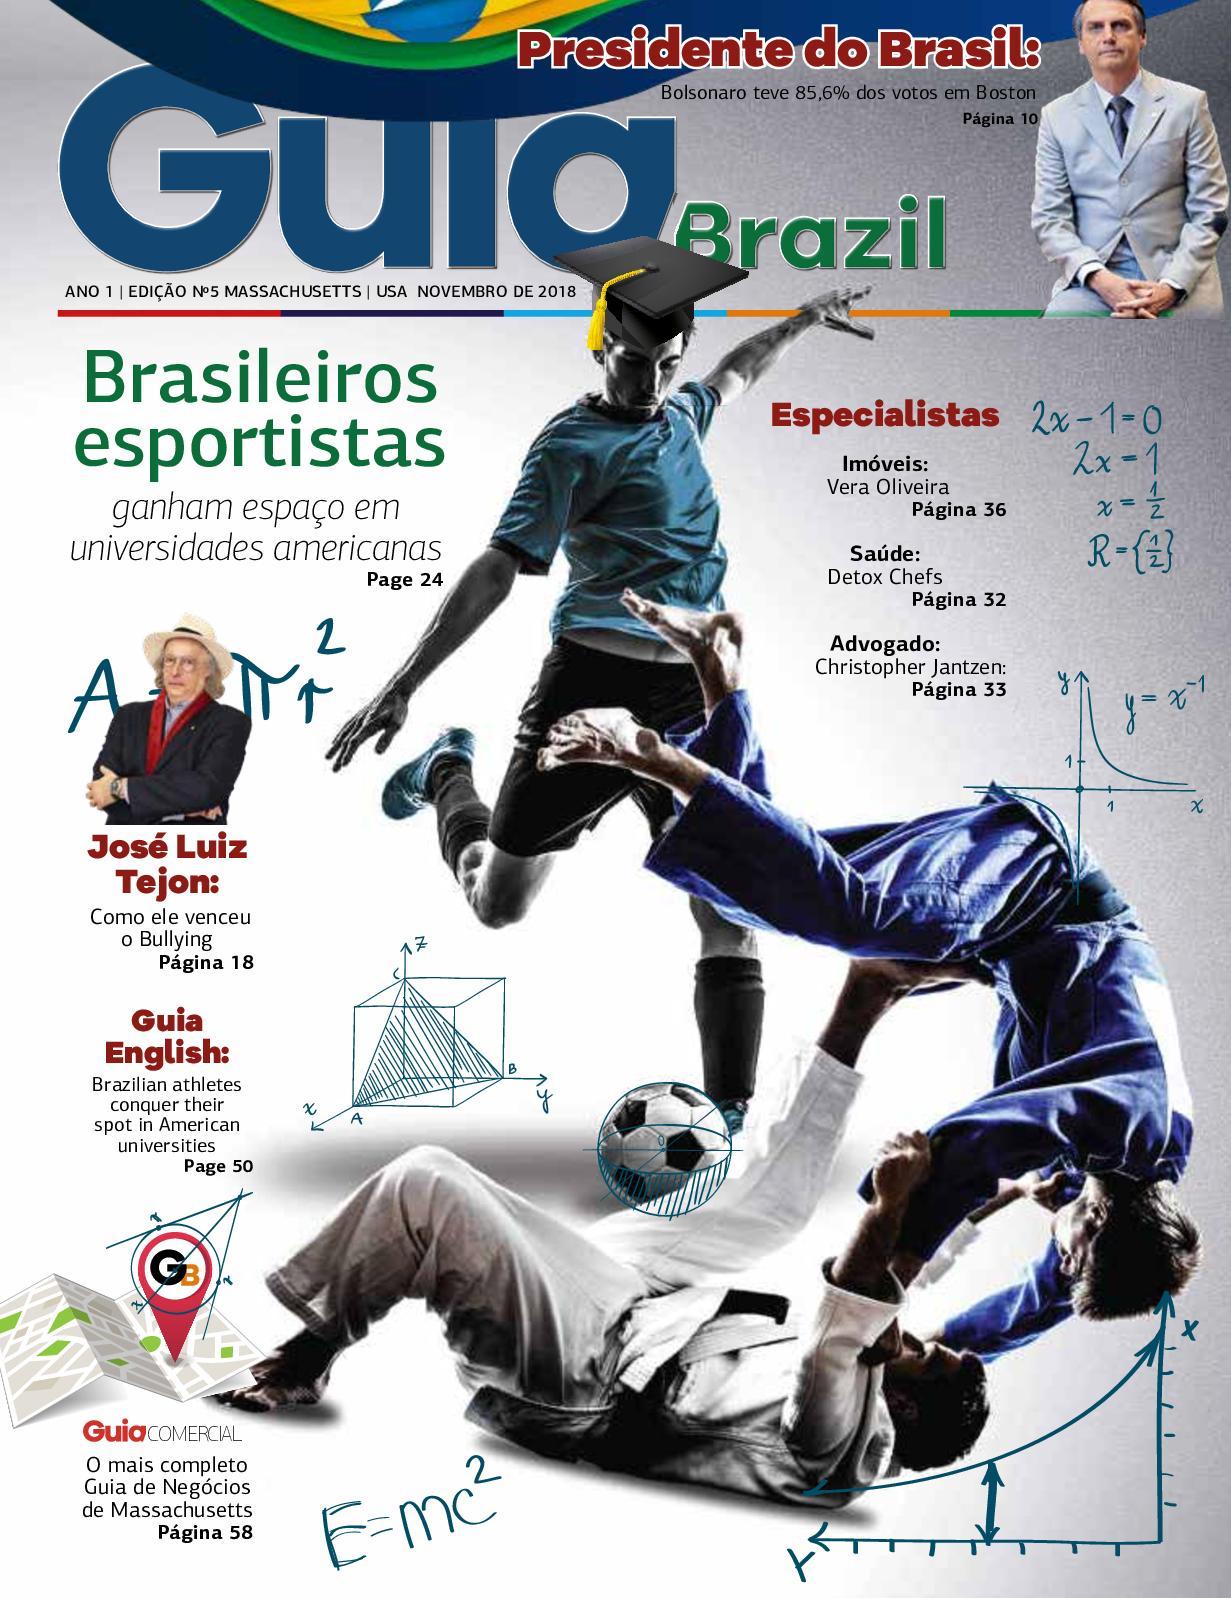 Calaméo - GUIA BRAZIL 05 02 3e7844e7e0